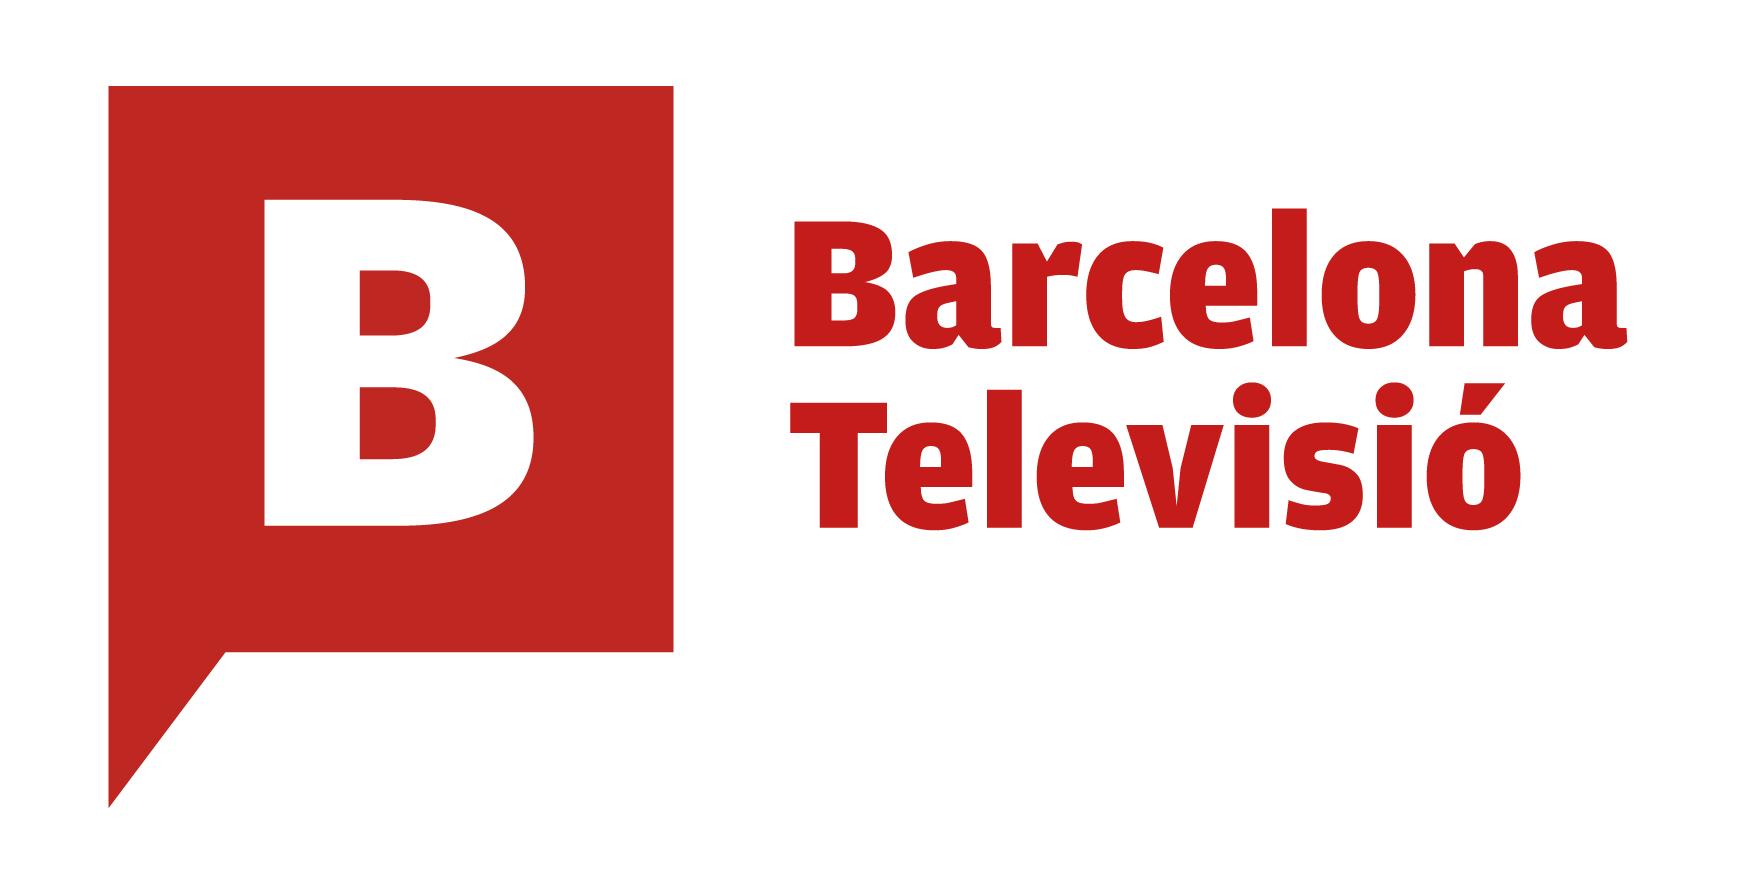 btv-barcelona-televisio-logo-alta